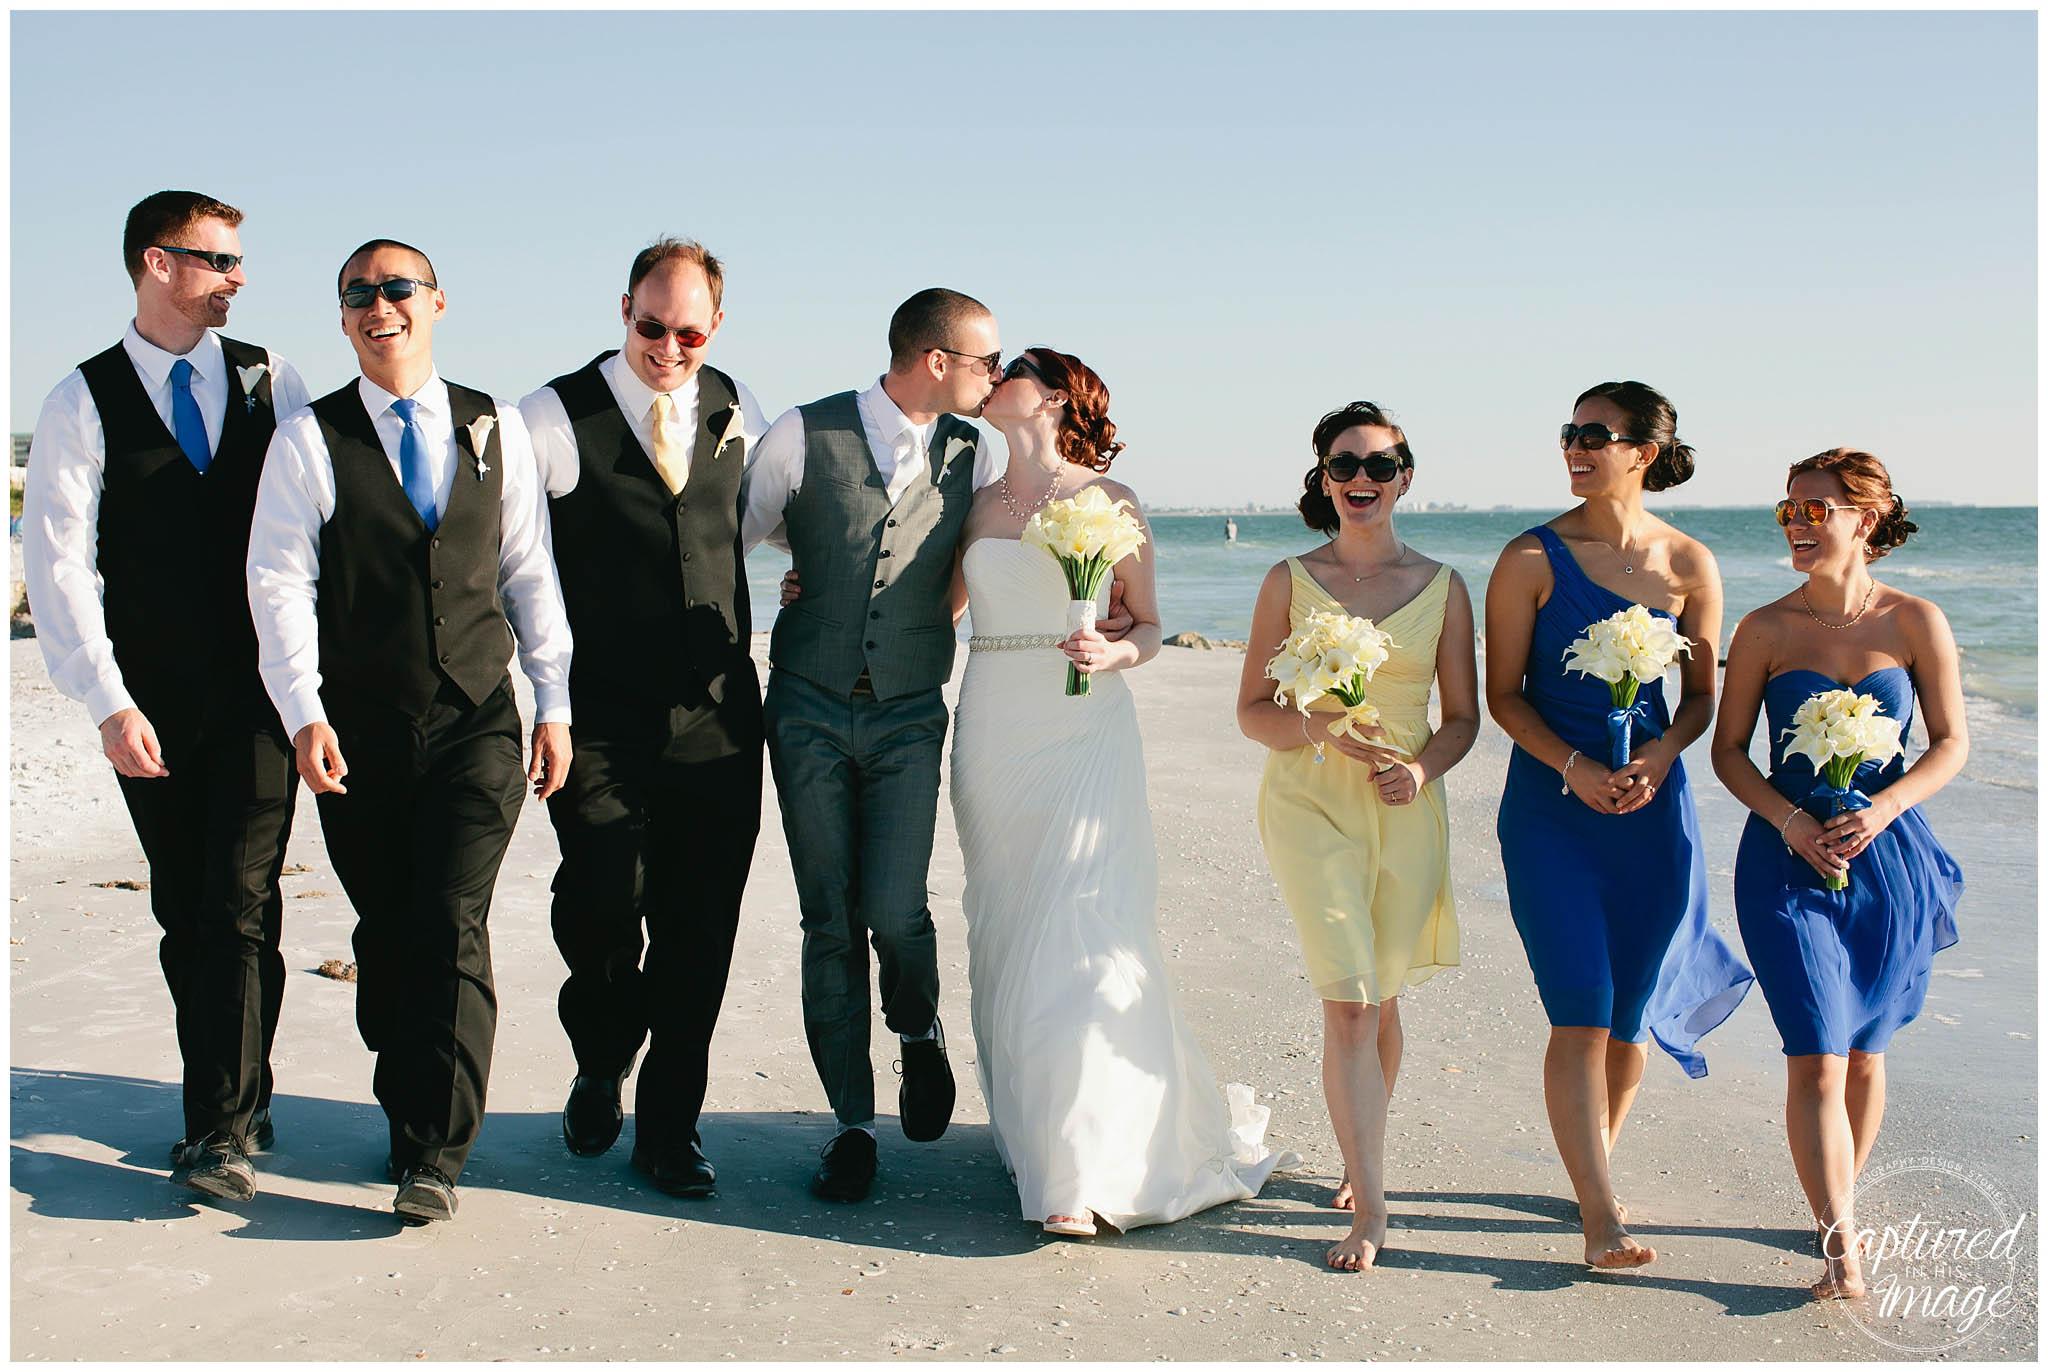 St. Pete Beach Destination Wedding (15 of 81)